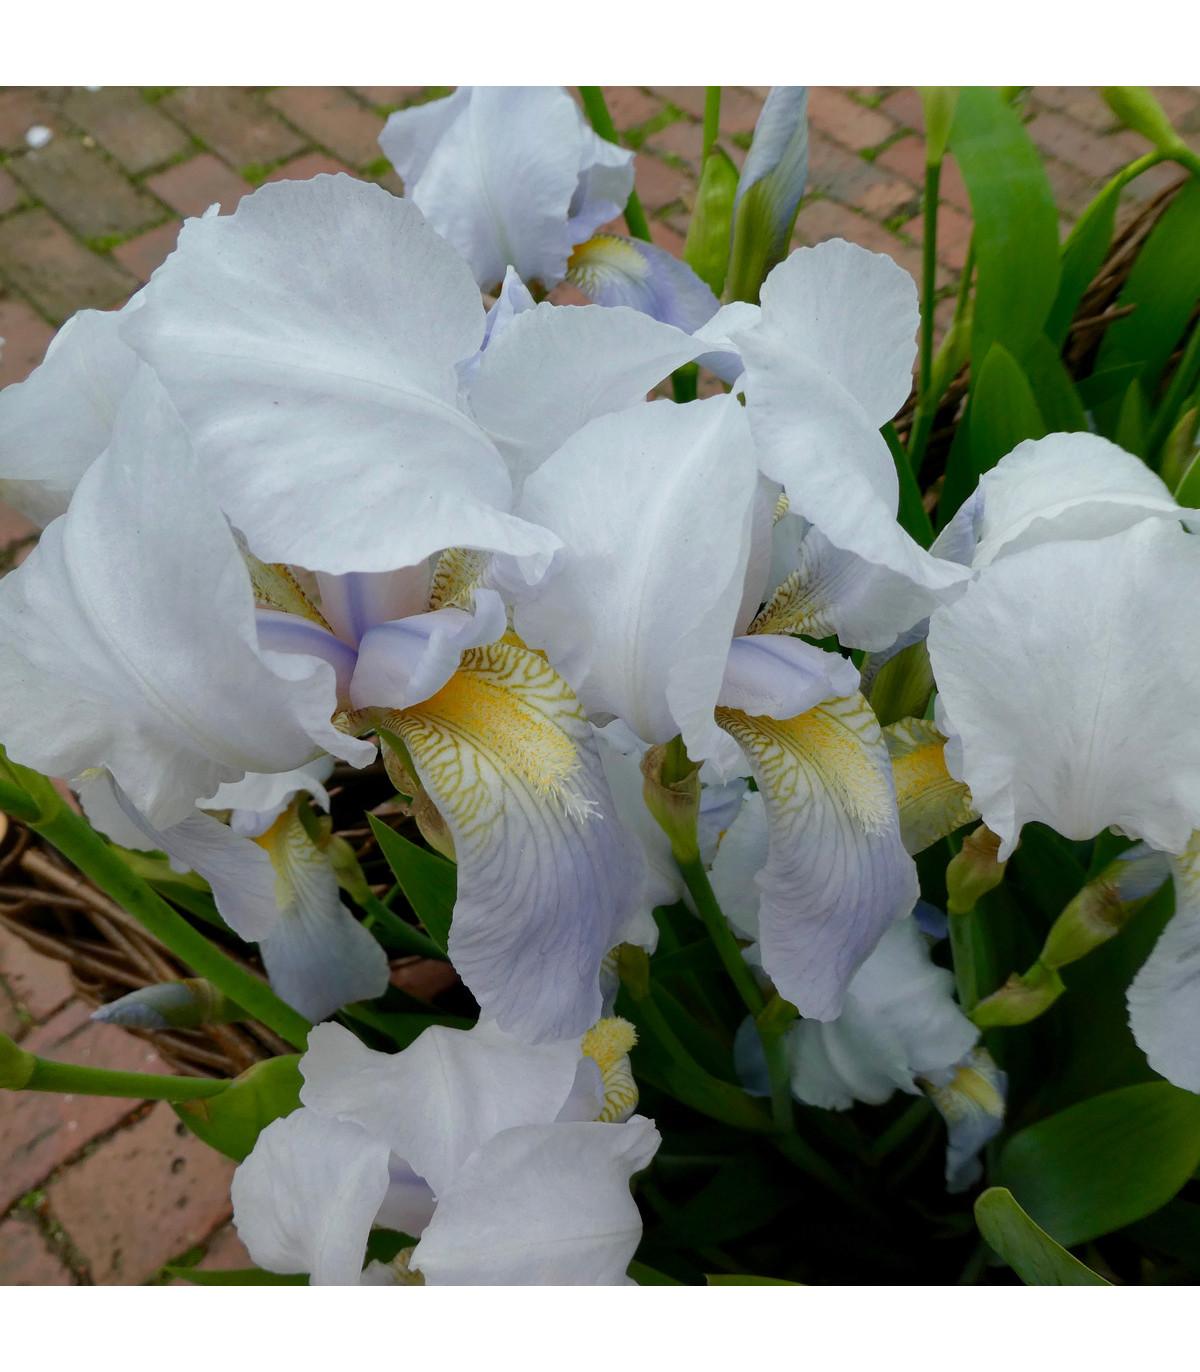 Kosatec síťkovaný bílý - Iris reticulata - cibule kosatců - 3 ks